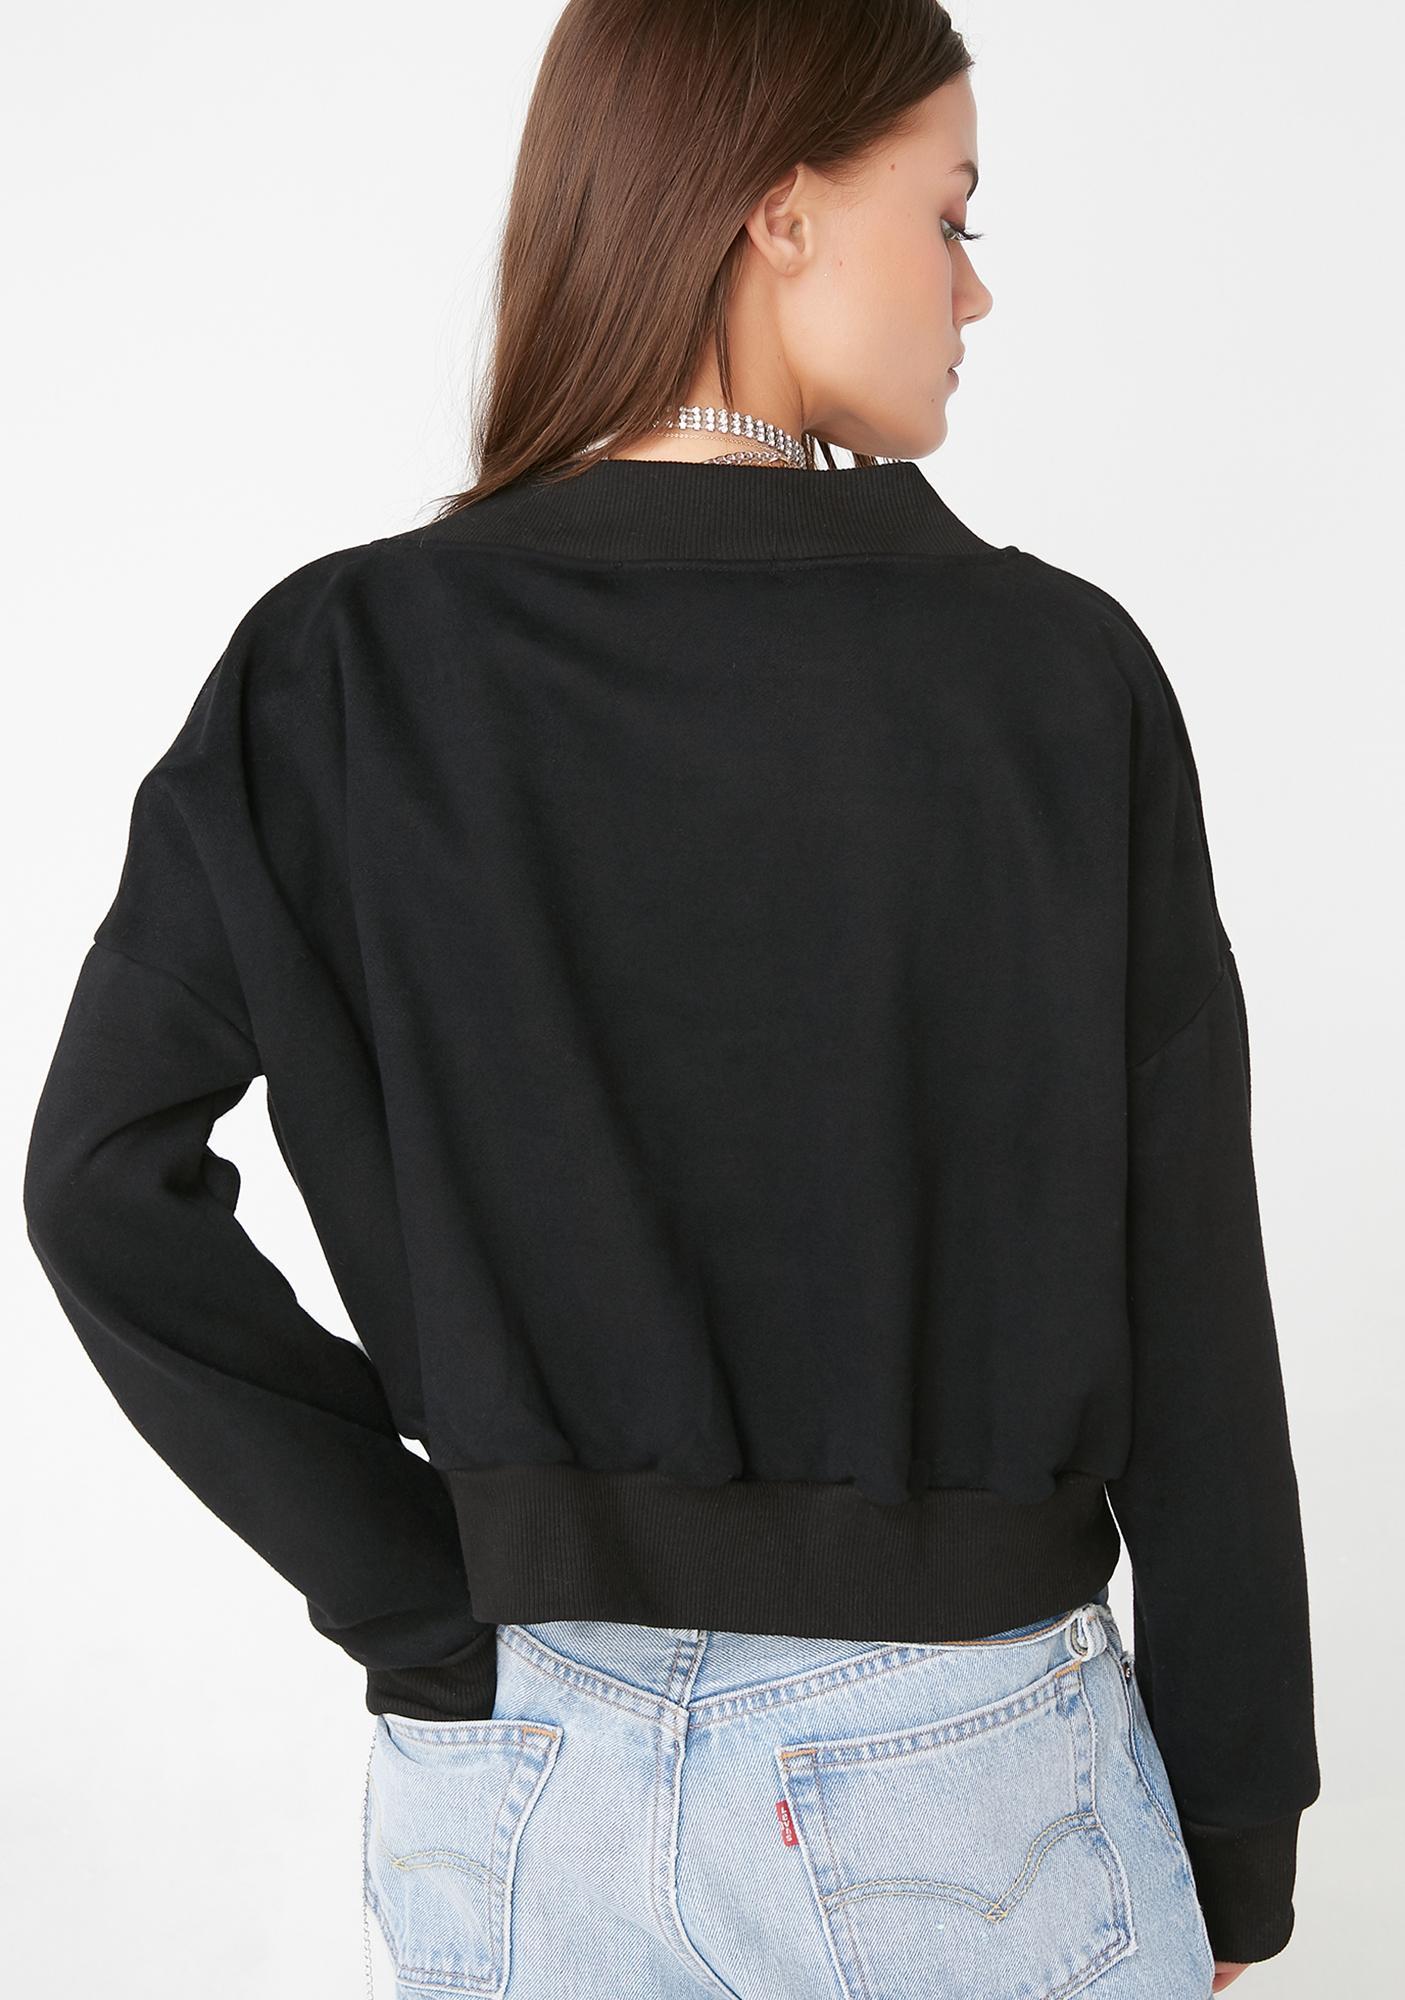 My Mum Made It Midnight V-Neck Sweater